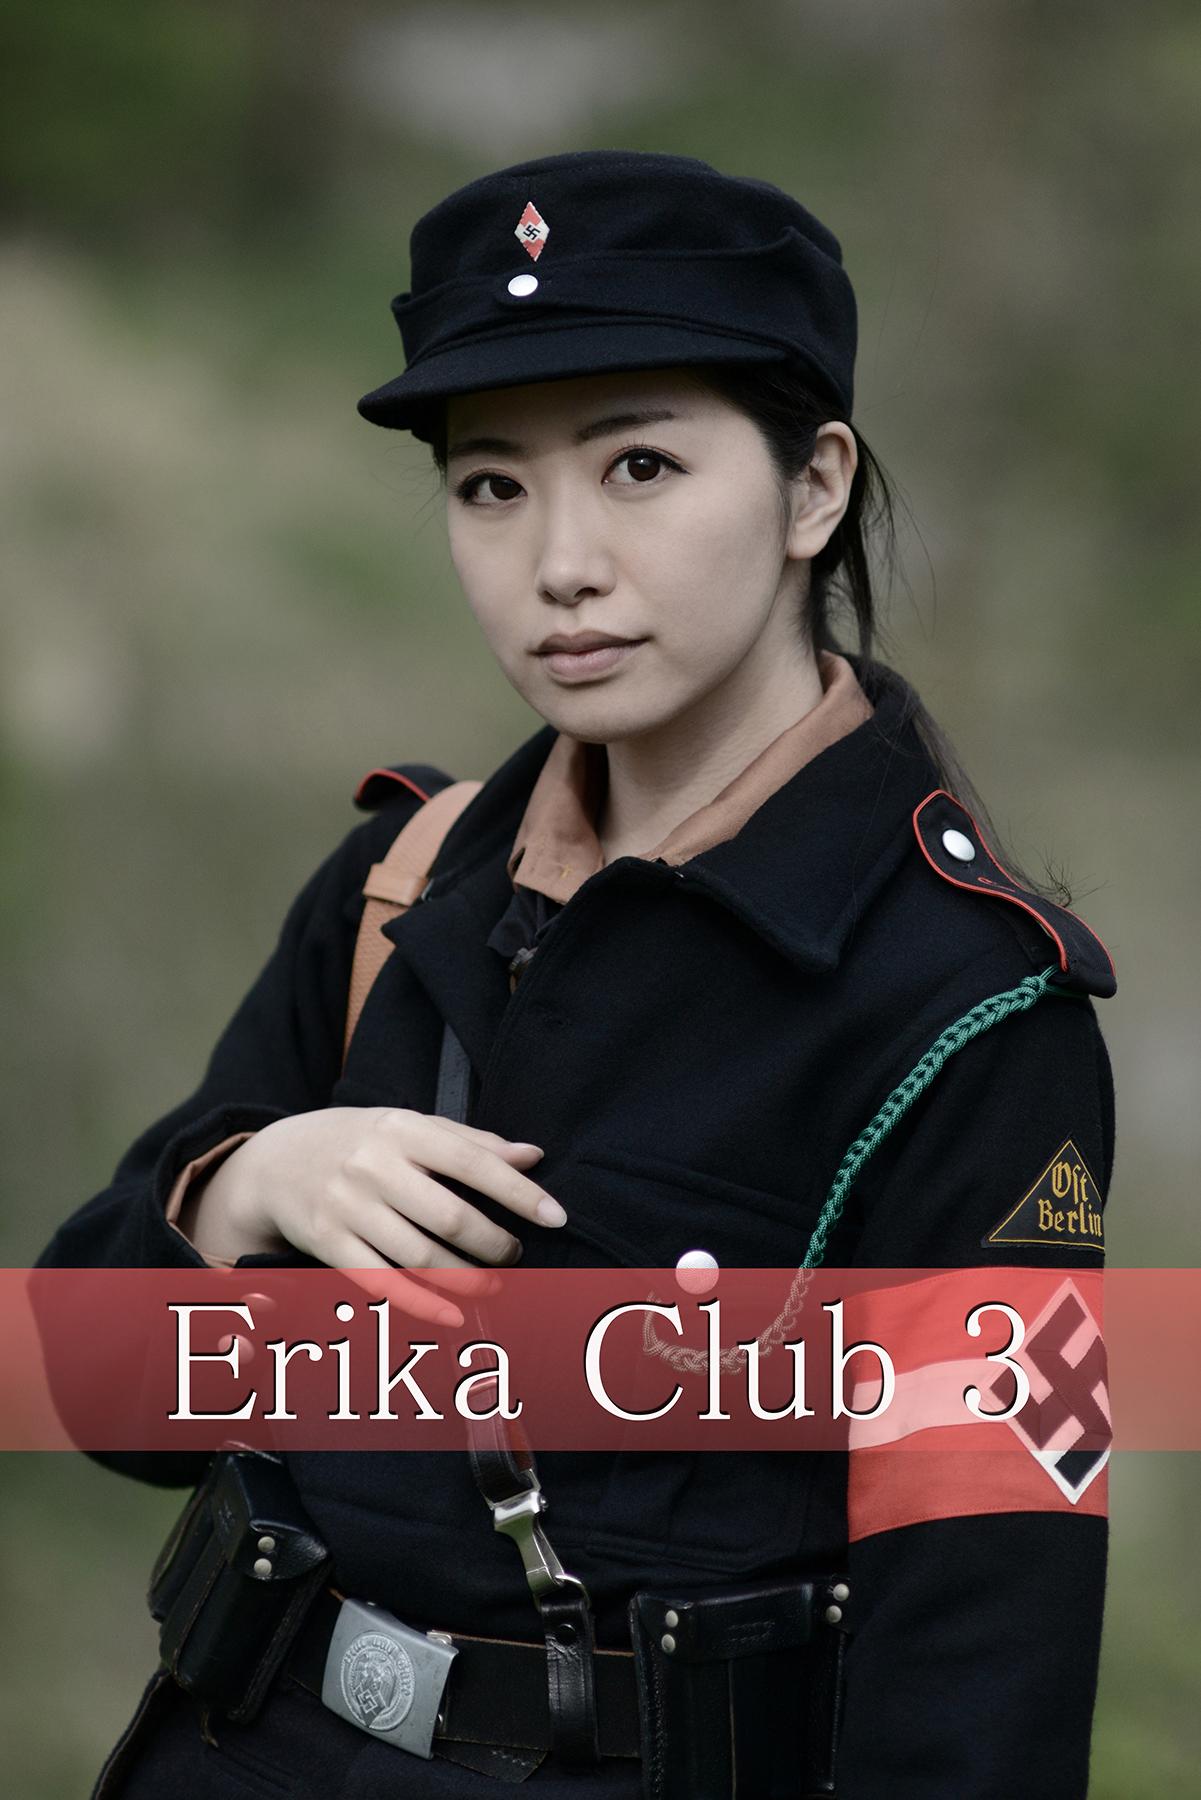 Erika Club・3/紙媒体写真集